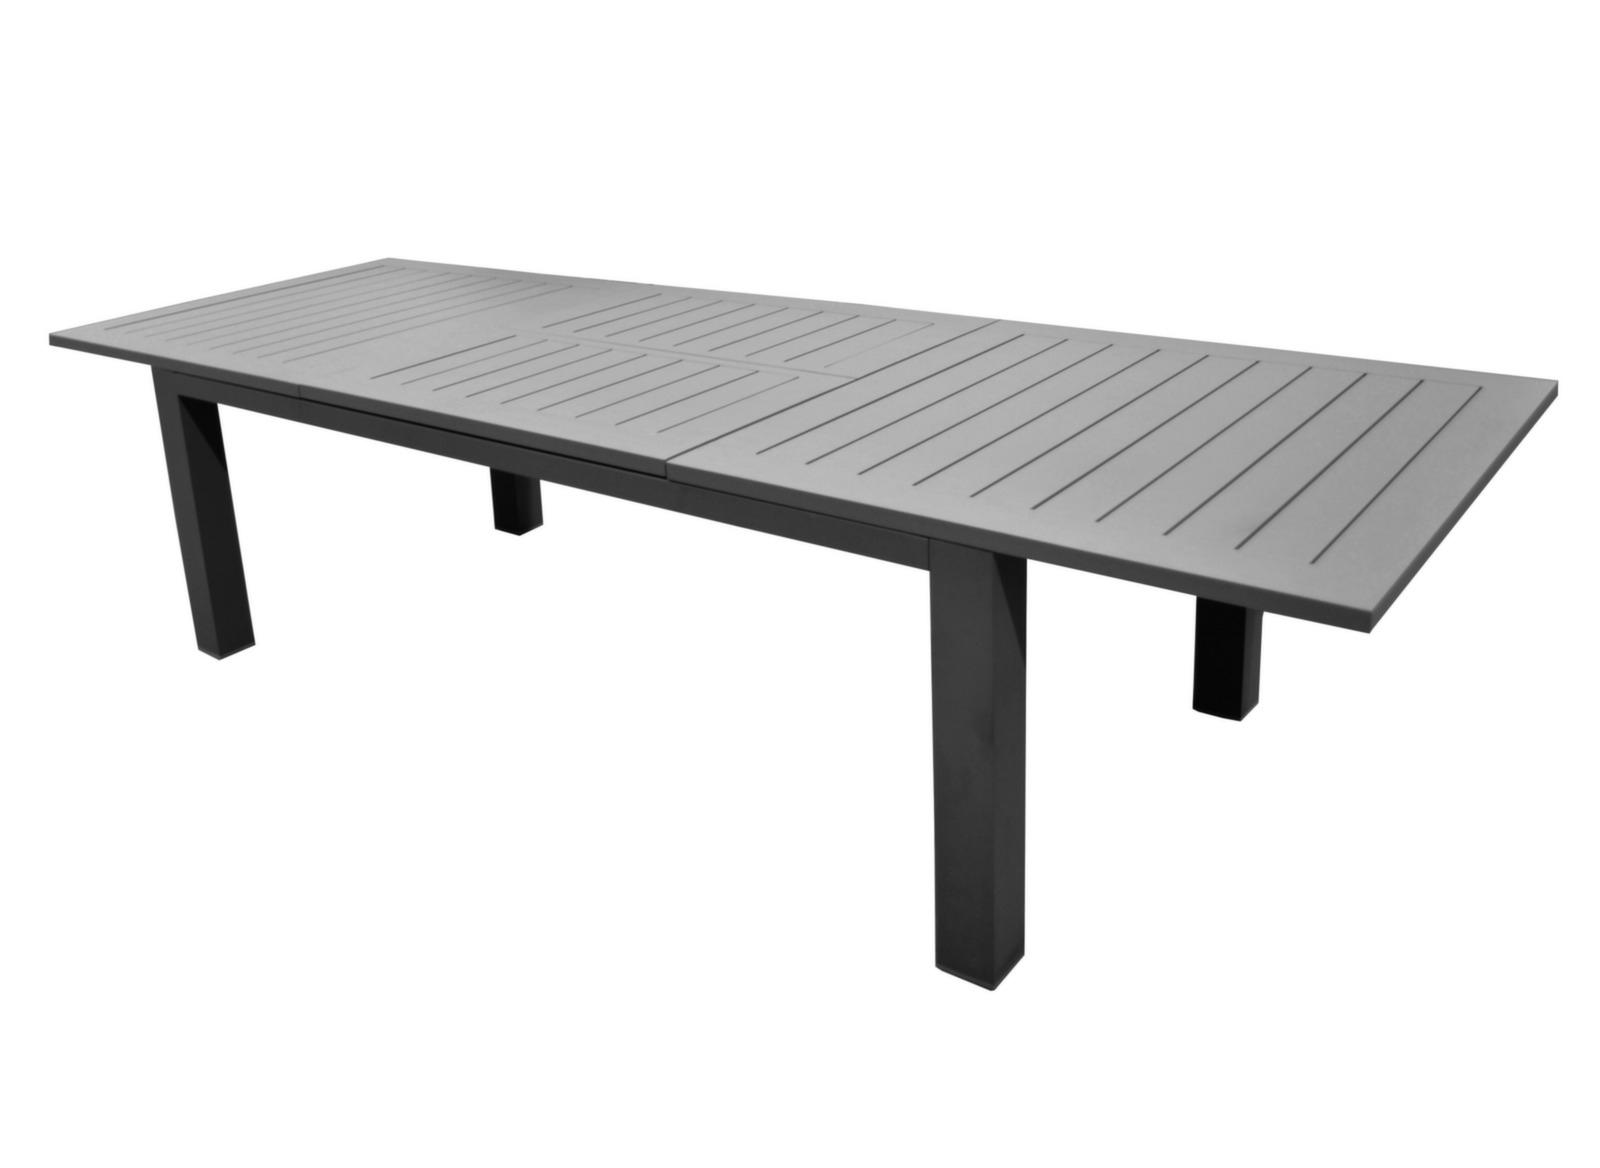 Table Aurore 214/311 Cm (Finition Brush) avec Table De Jardin En Aluminium Avec Rallonge